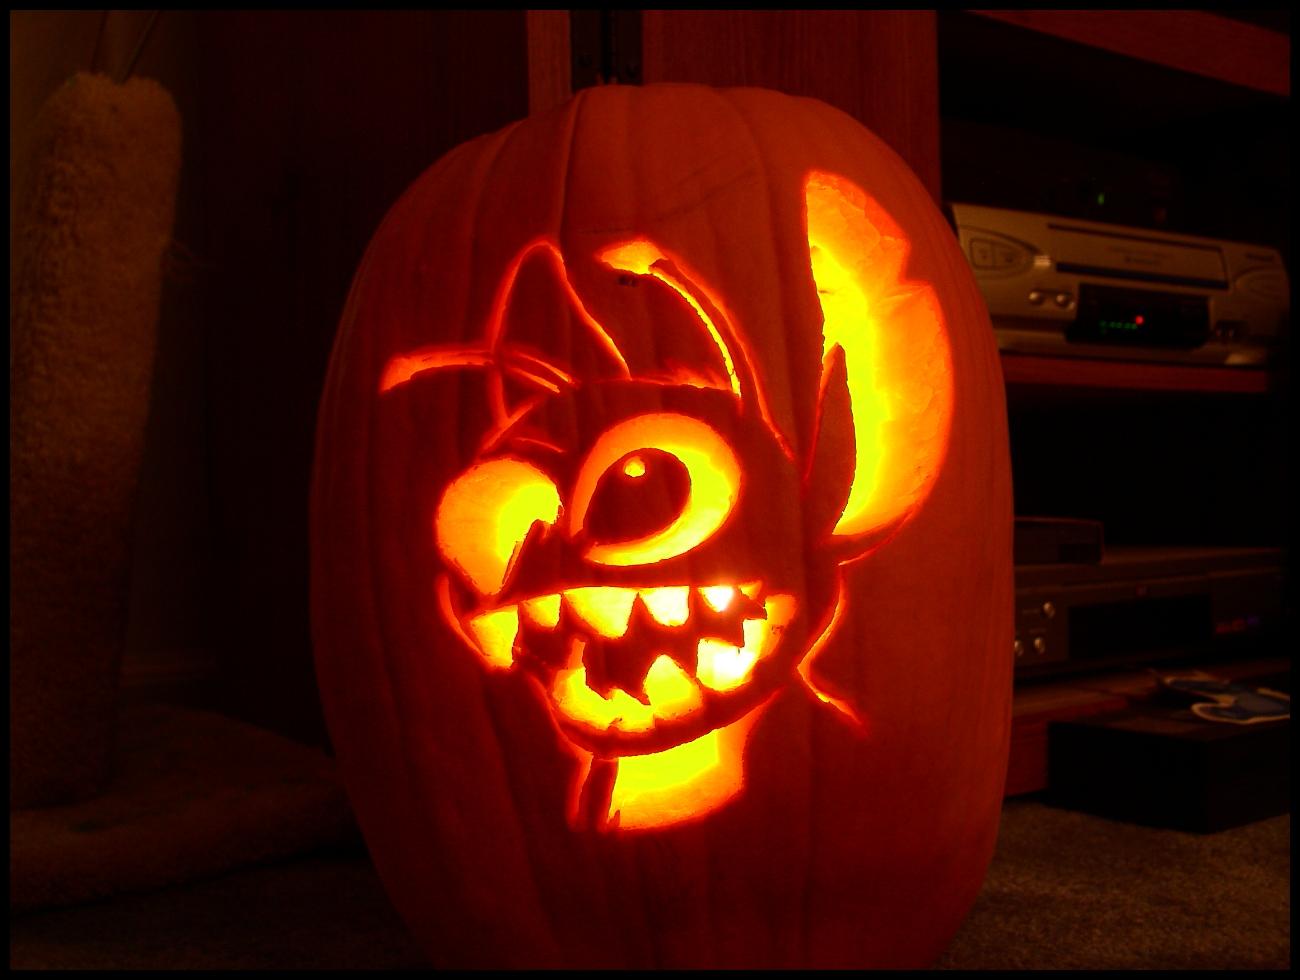 10 Wonderful Cool Ideas For Pumpkin Carving cool pumpkin carving ideas twuzzer 1 2020